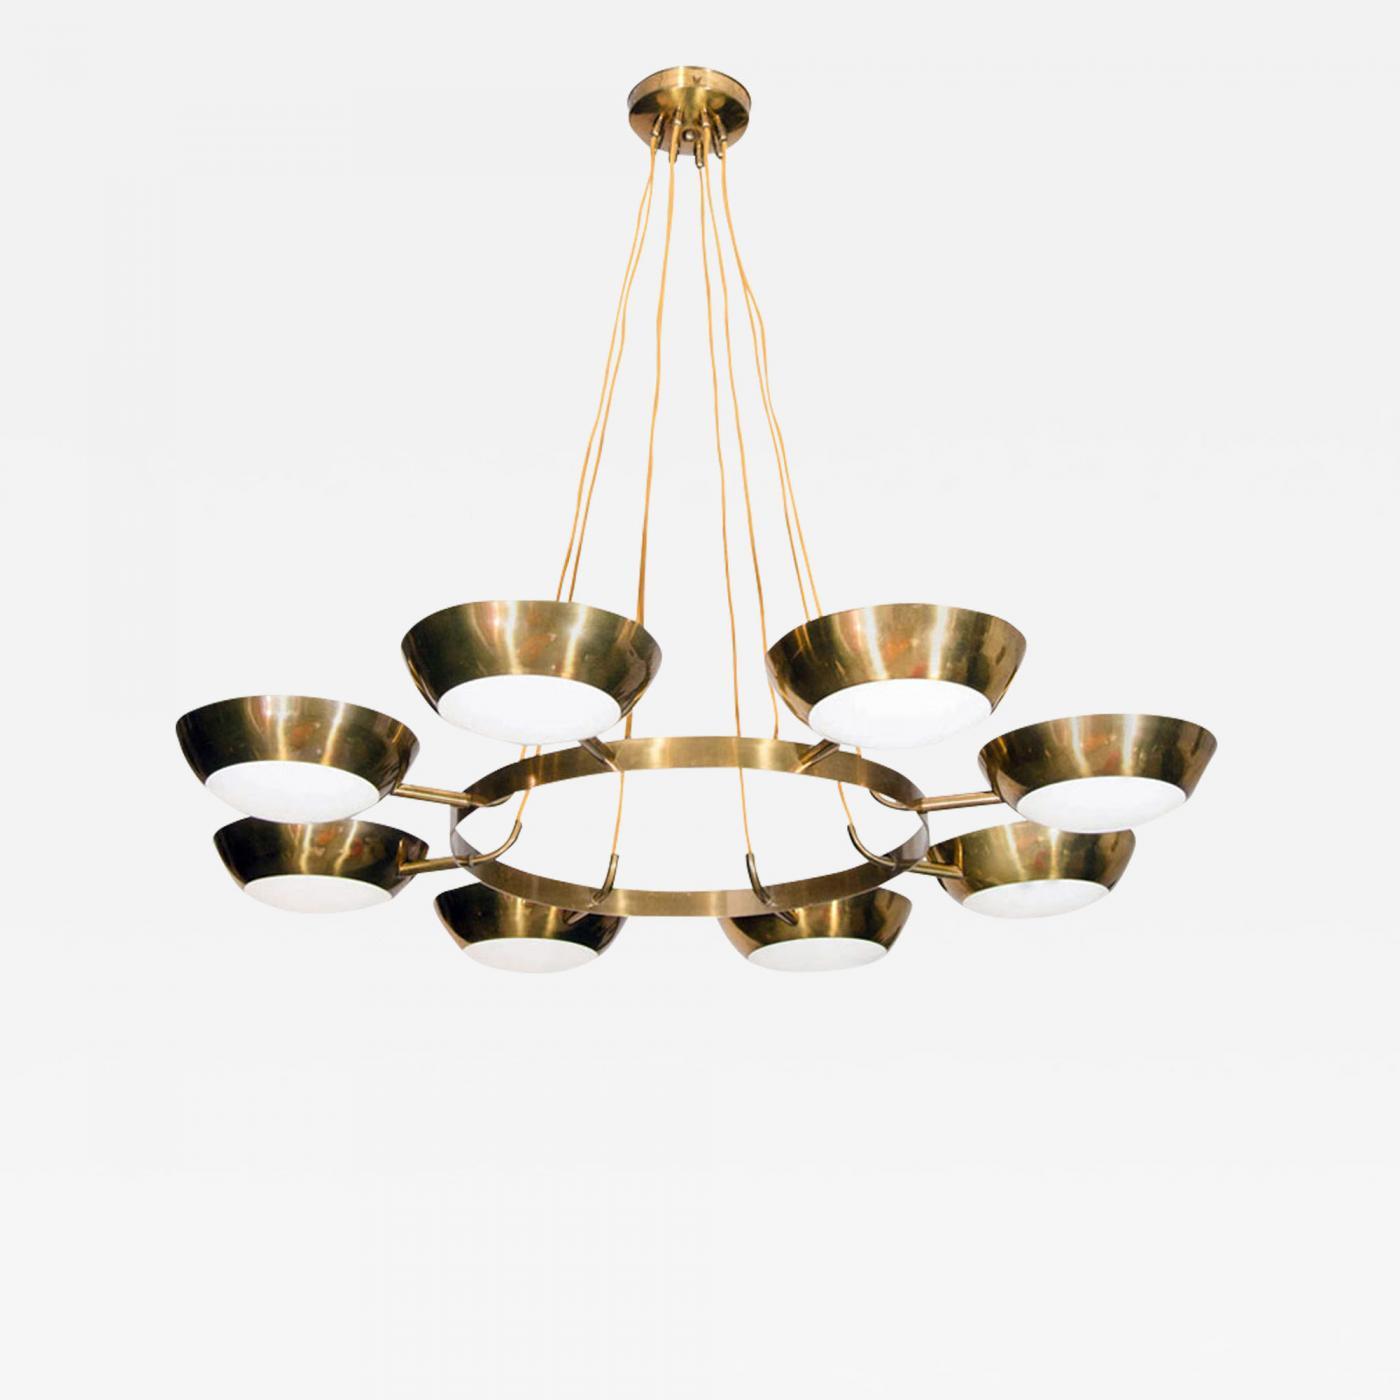 Stilnovo stilnovo chandelier listings furniture lighting chandeliers and pendants stilnovo stilnovo chandelier aloadofball Gallery